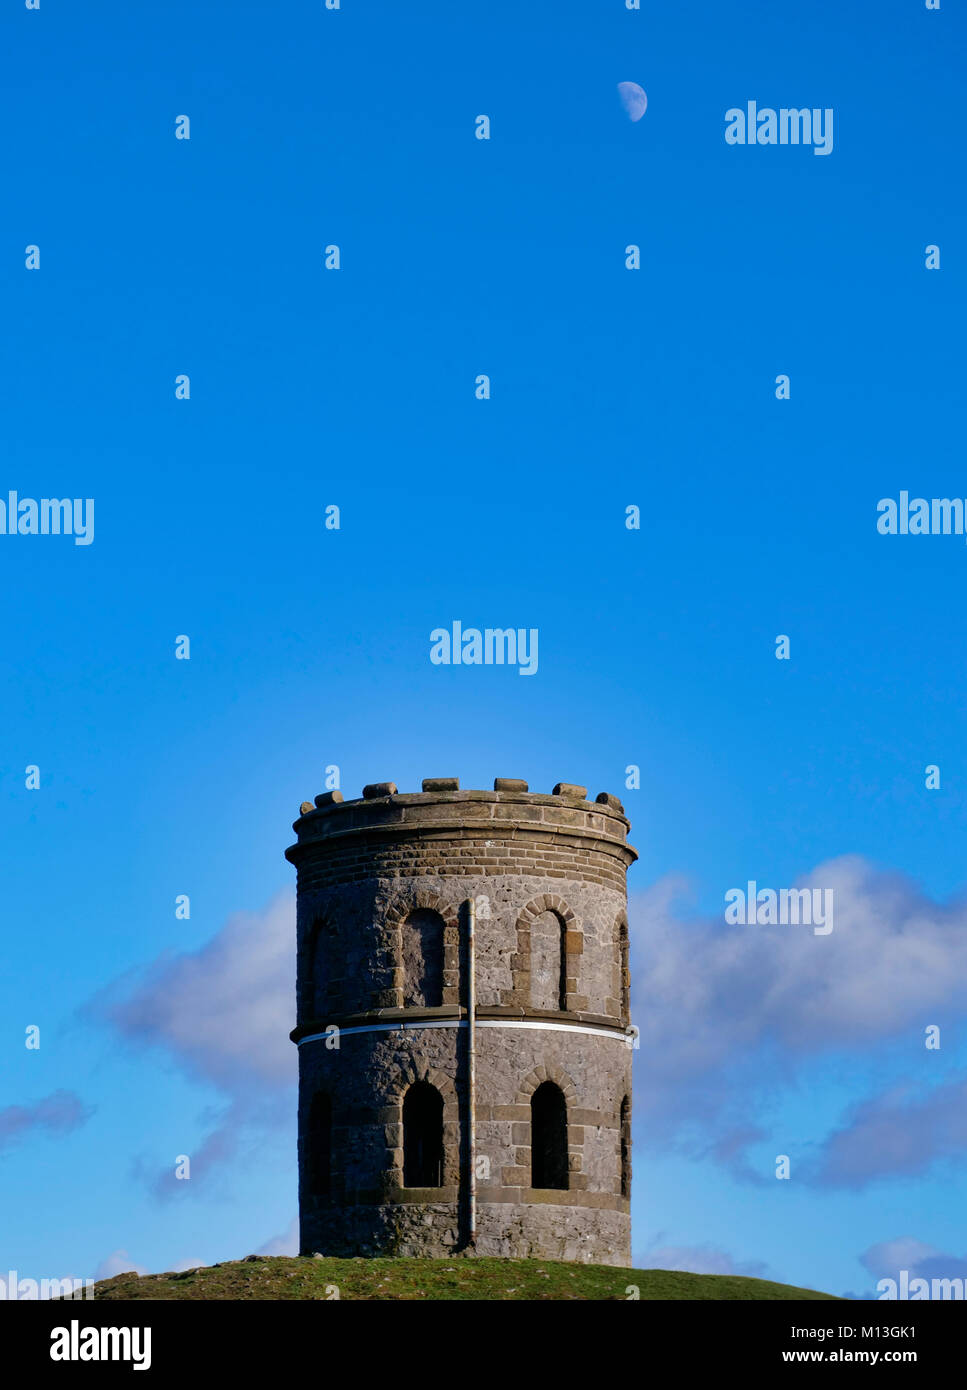 Solomon's Temple, Buxton. 26th Jan, 2018. UK Weather: bright blue skys over Solomon's Temple Buxton Derbyshire, - Stock Image